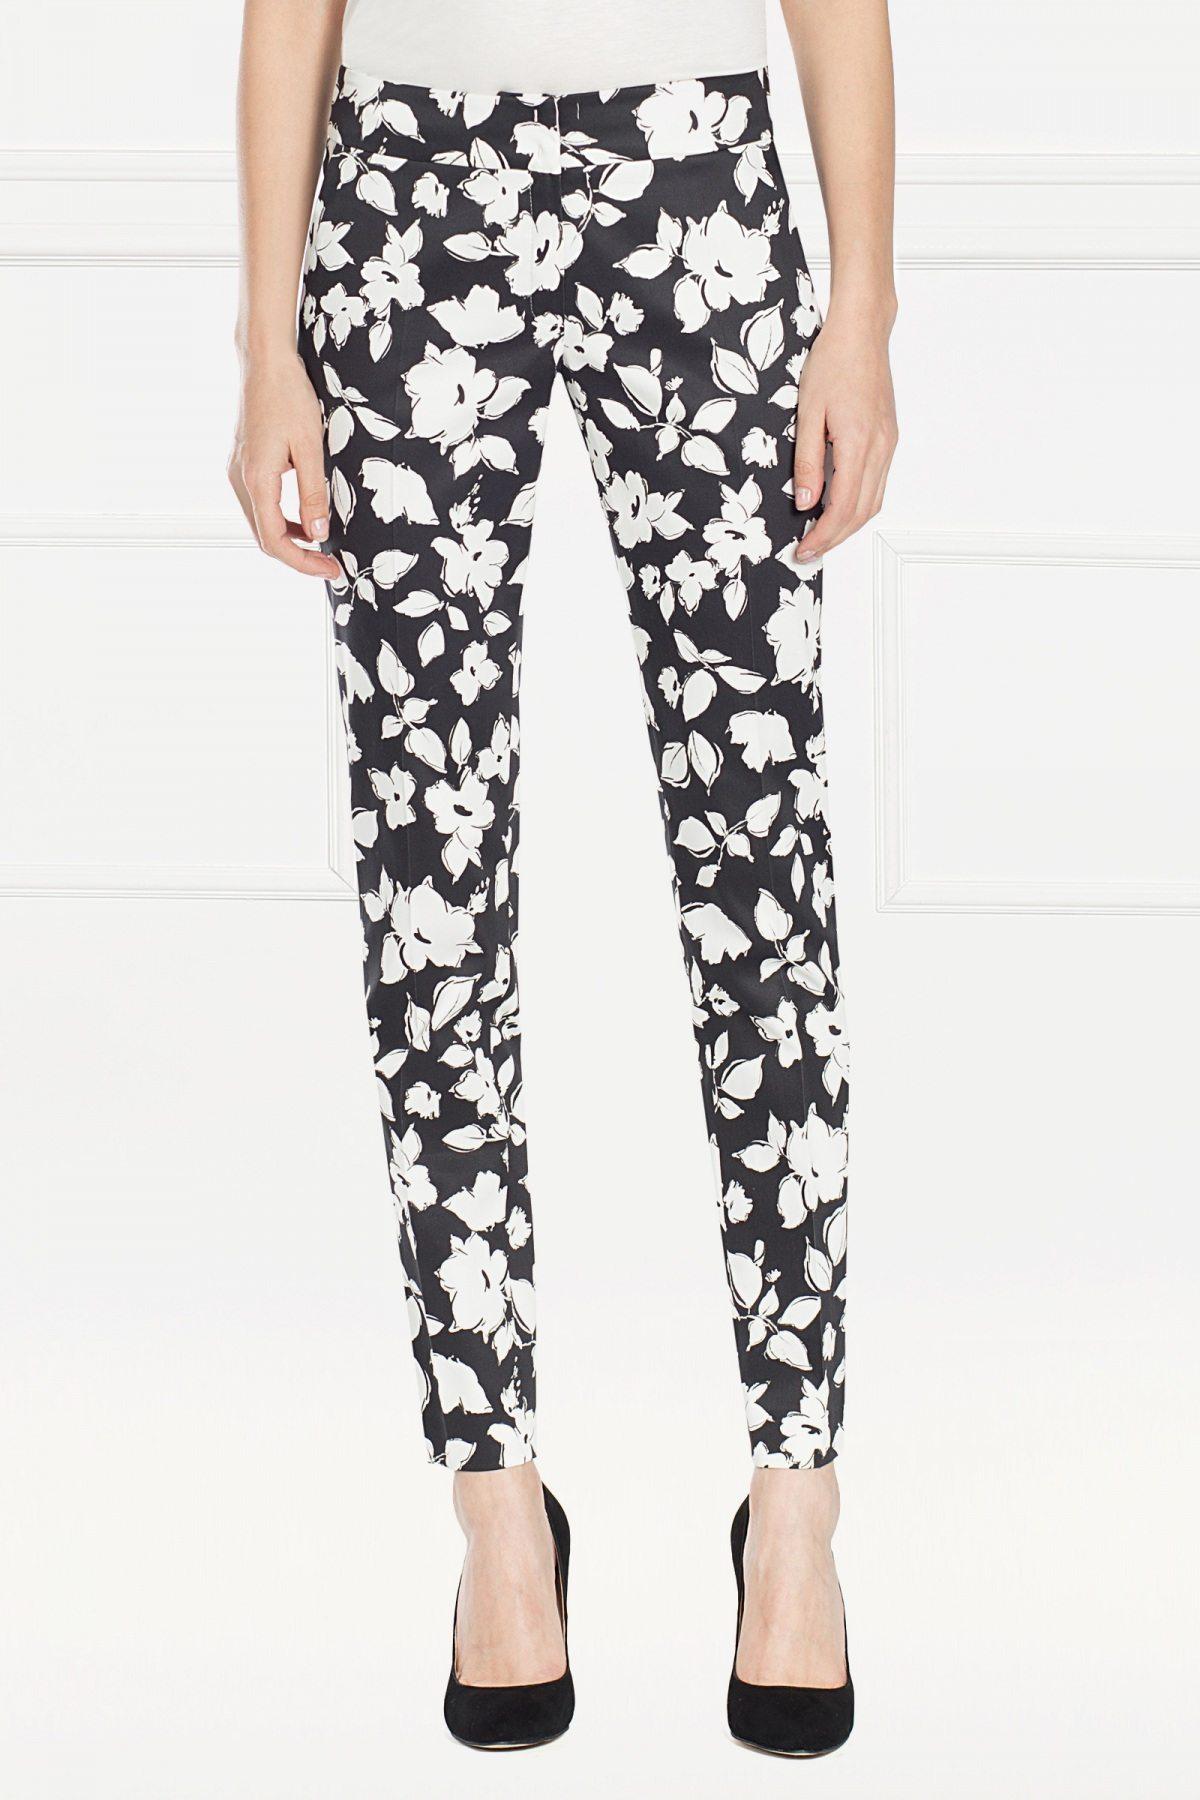 Pantaloni cu print floral Imprimat